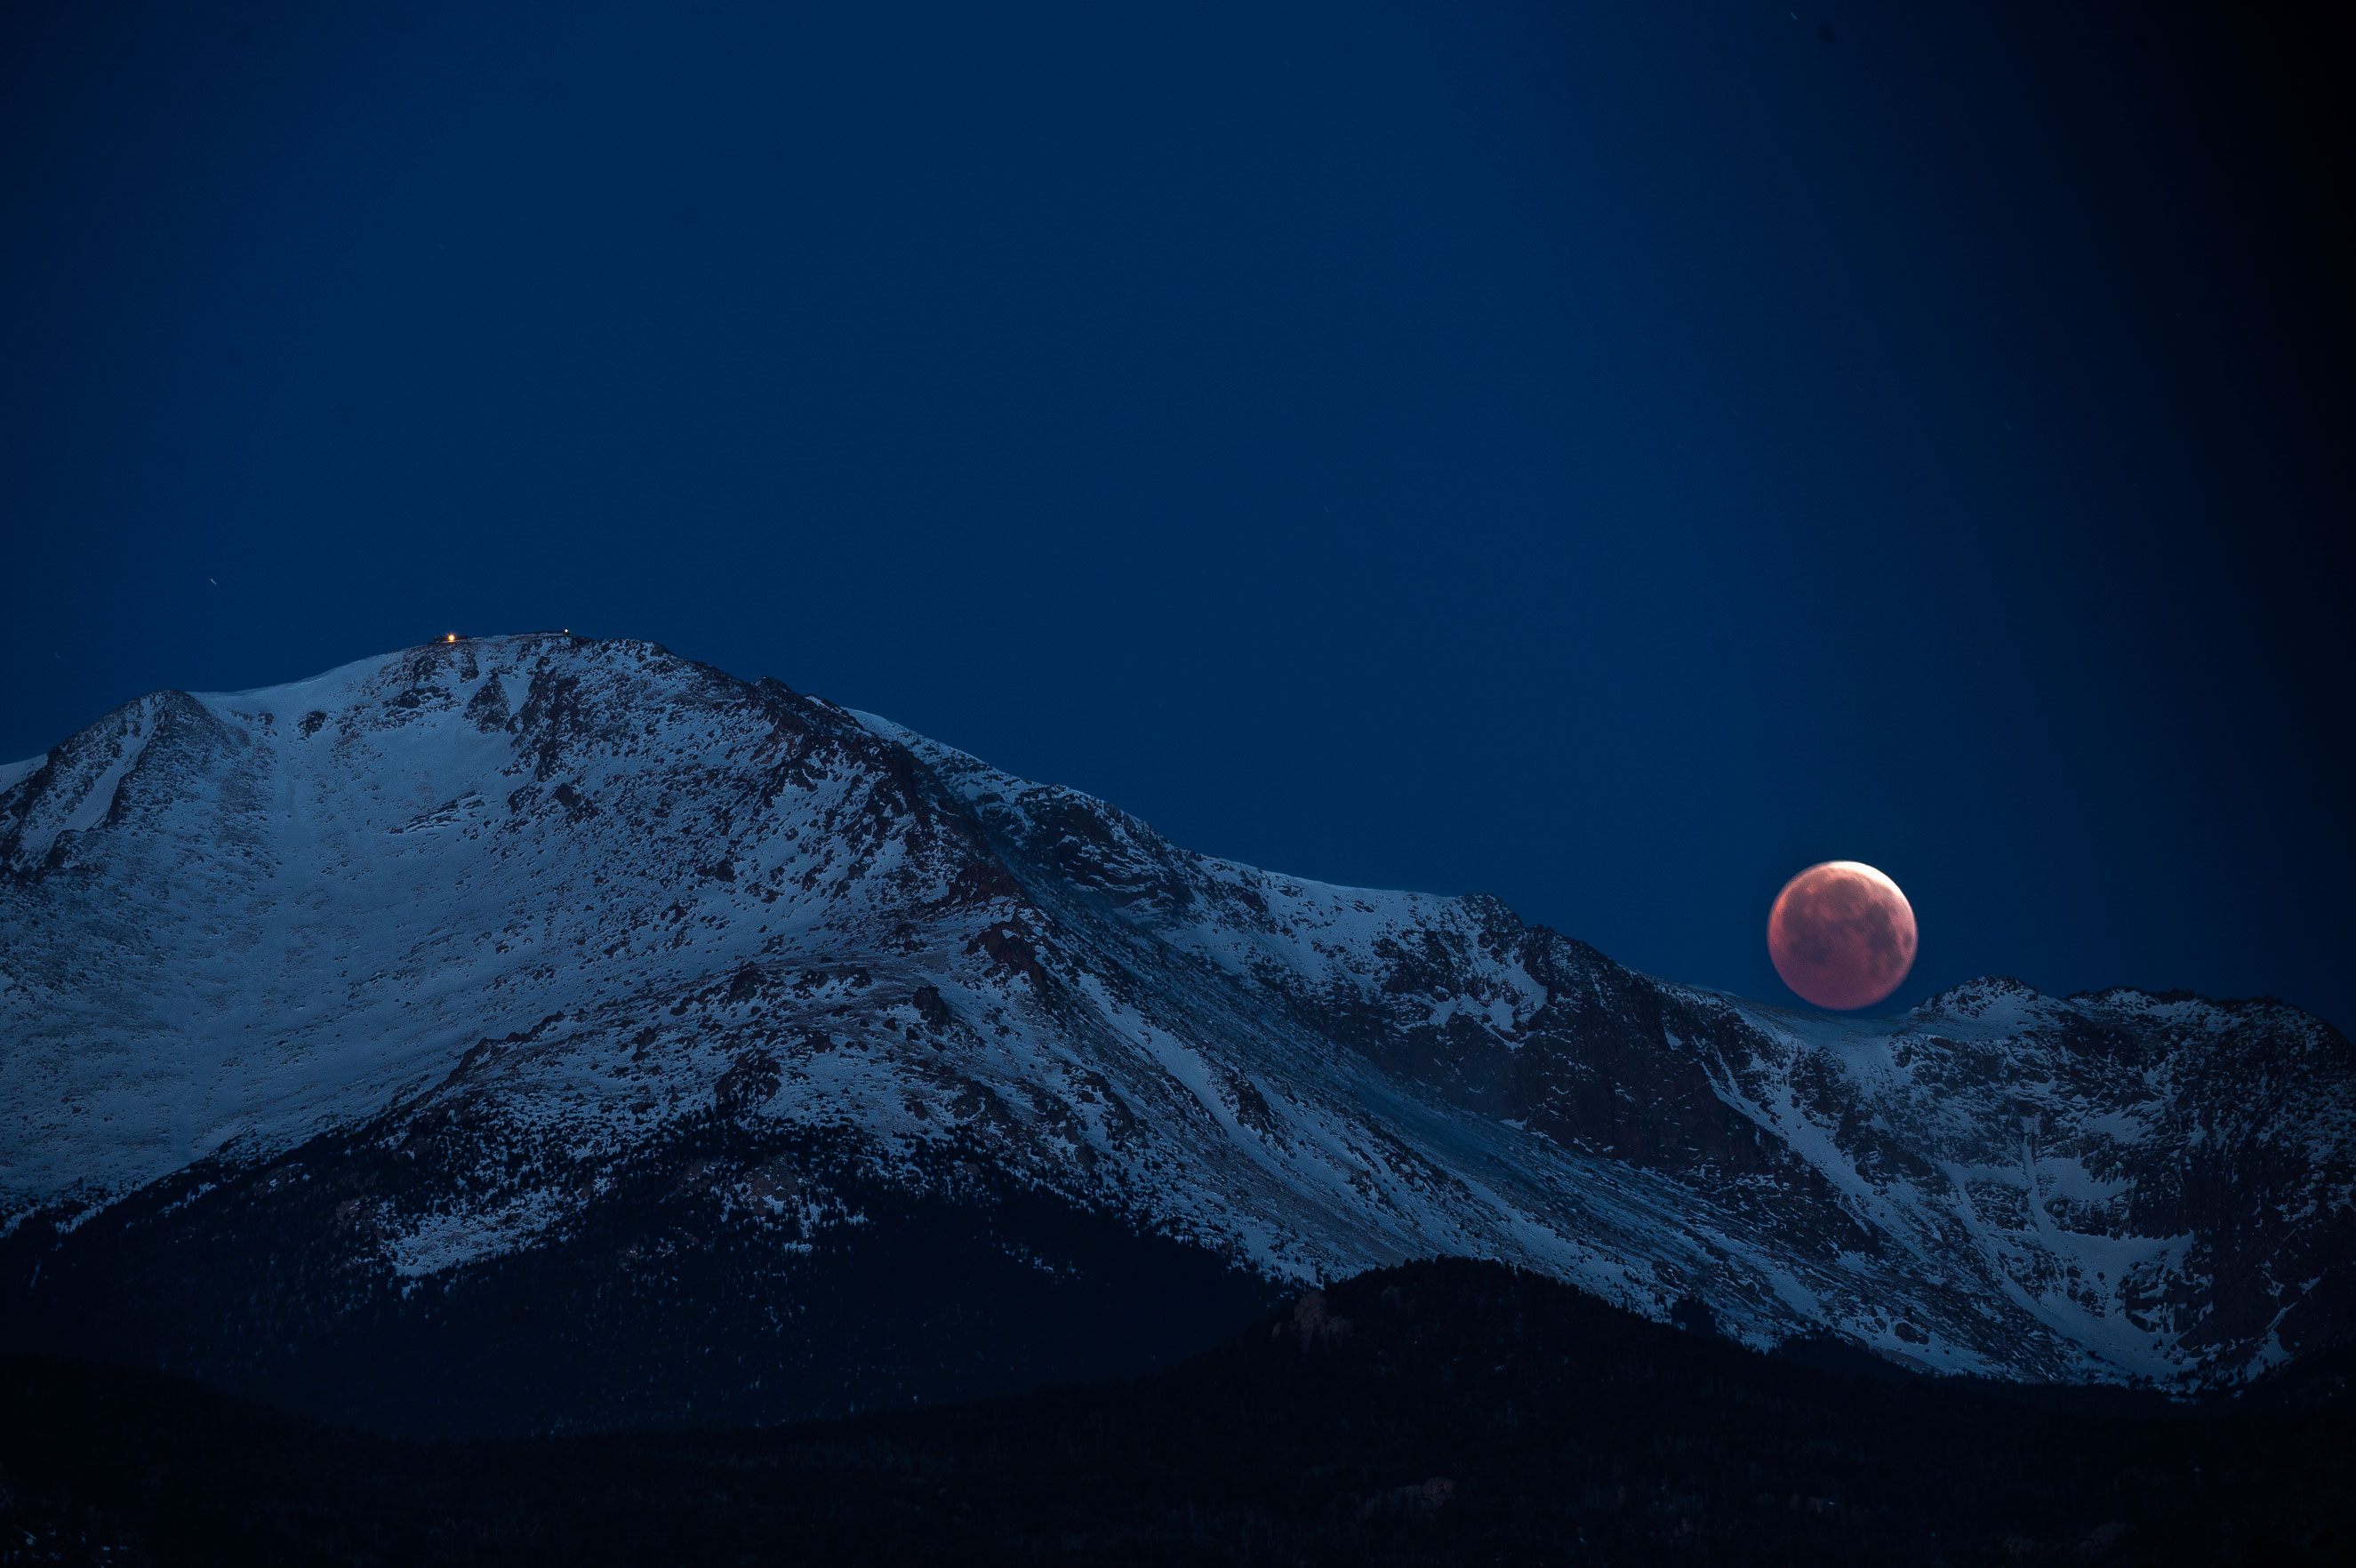 The blood moon lunar eclipse sets behind Pikes Peak April 4, 2015 in Colorado Springs.